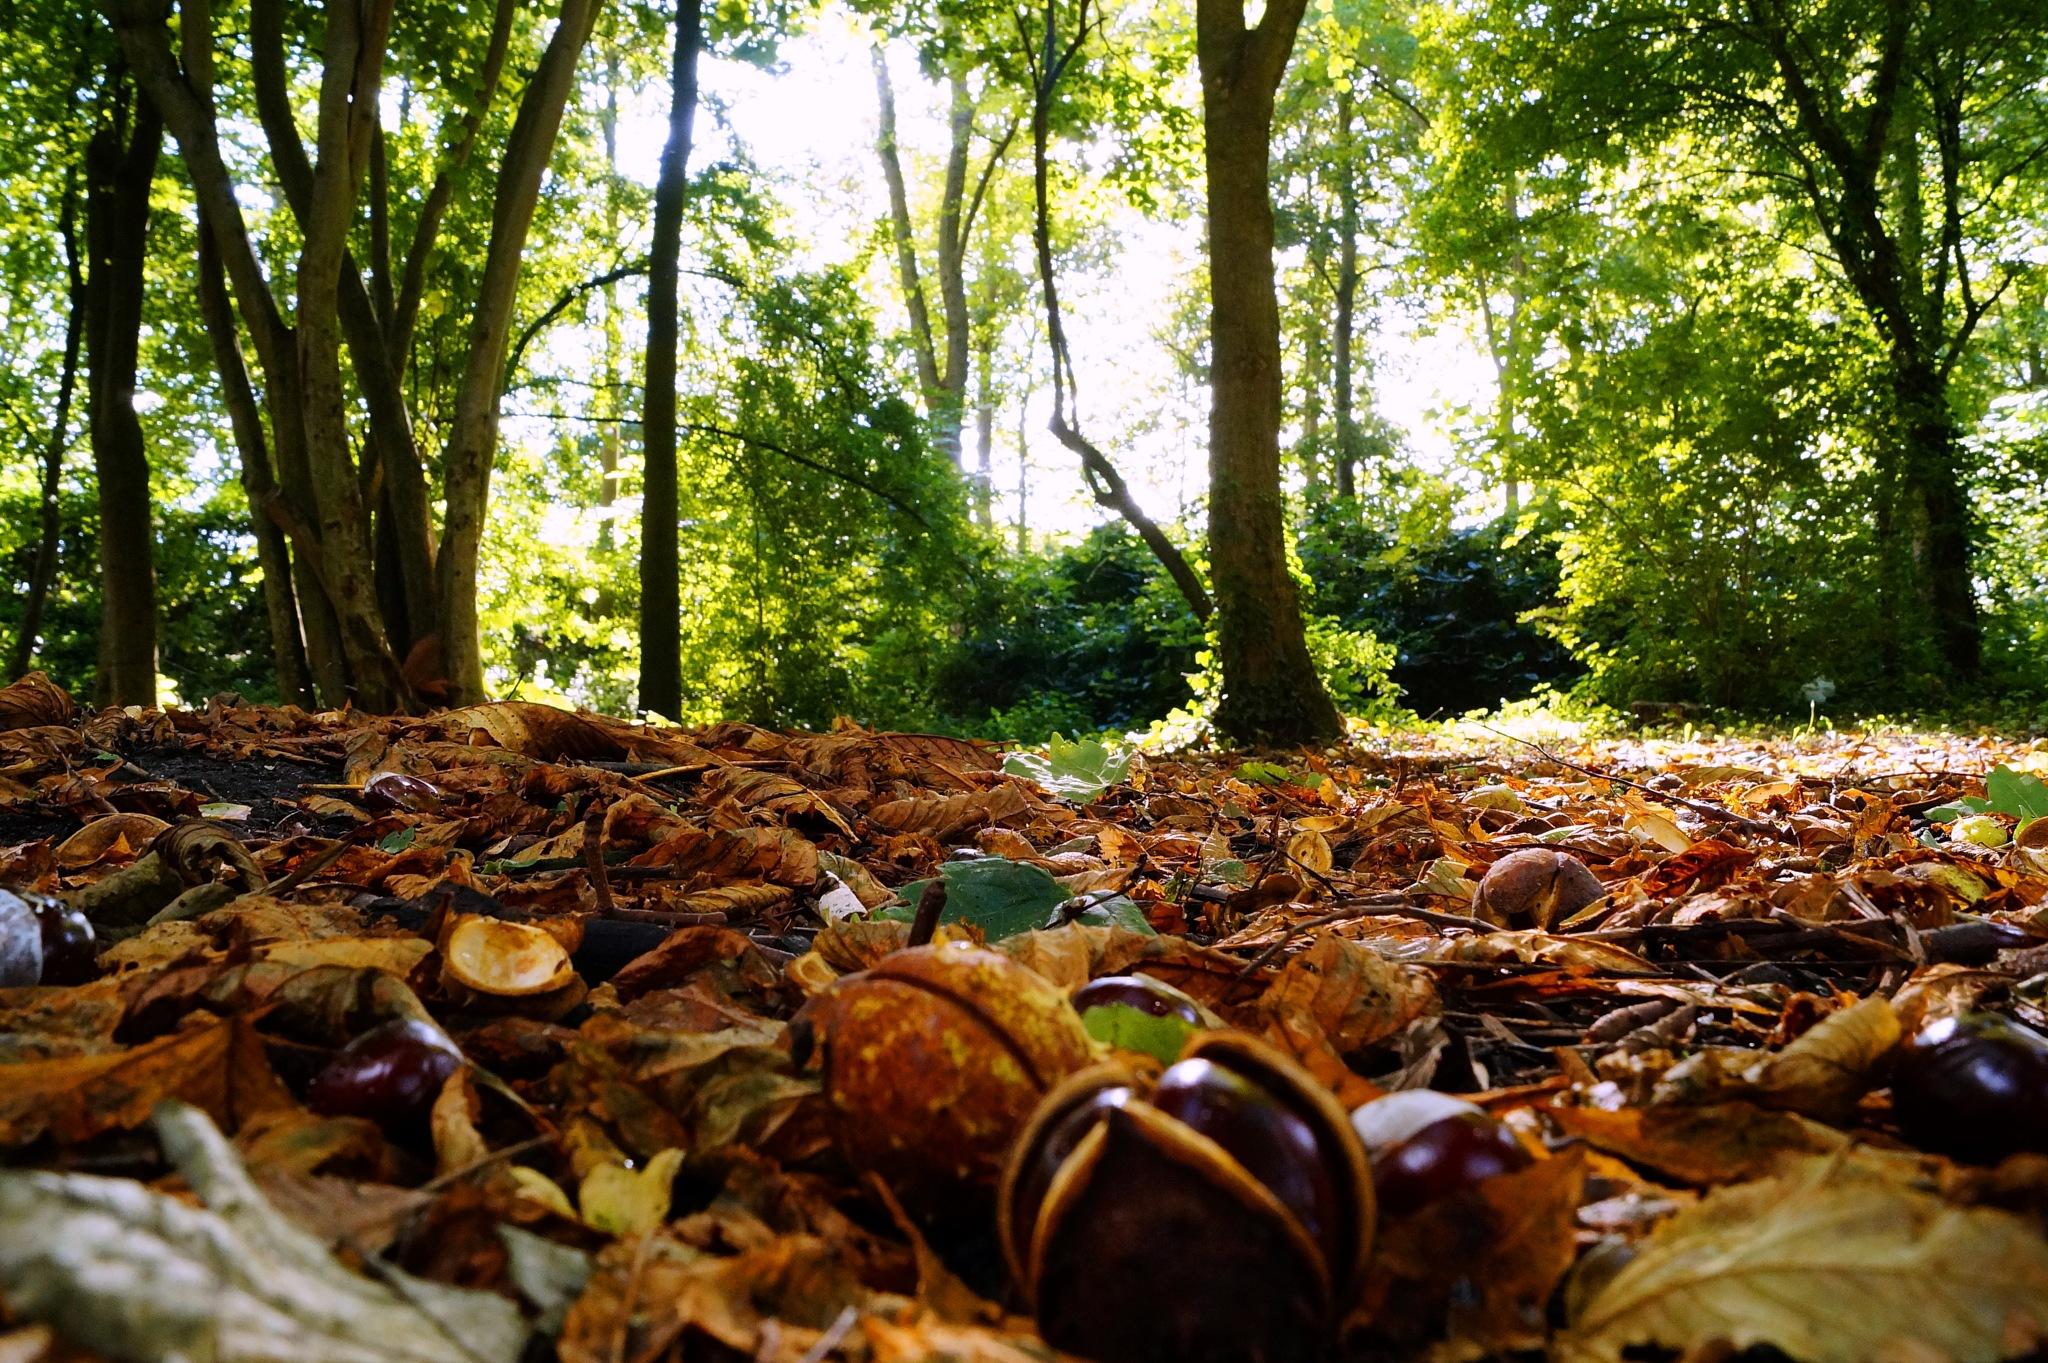 Beginning of Autumn by Marian Baay